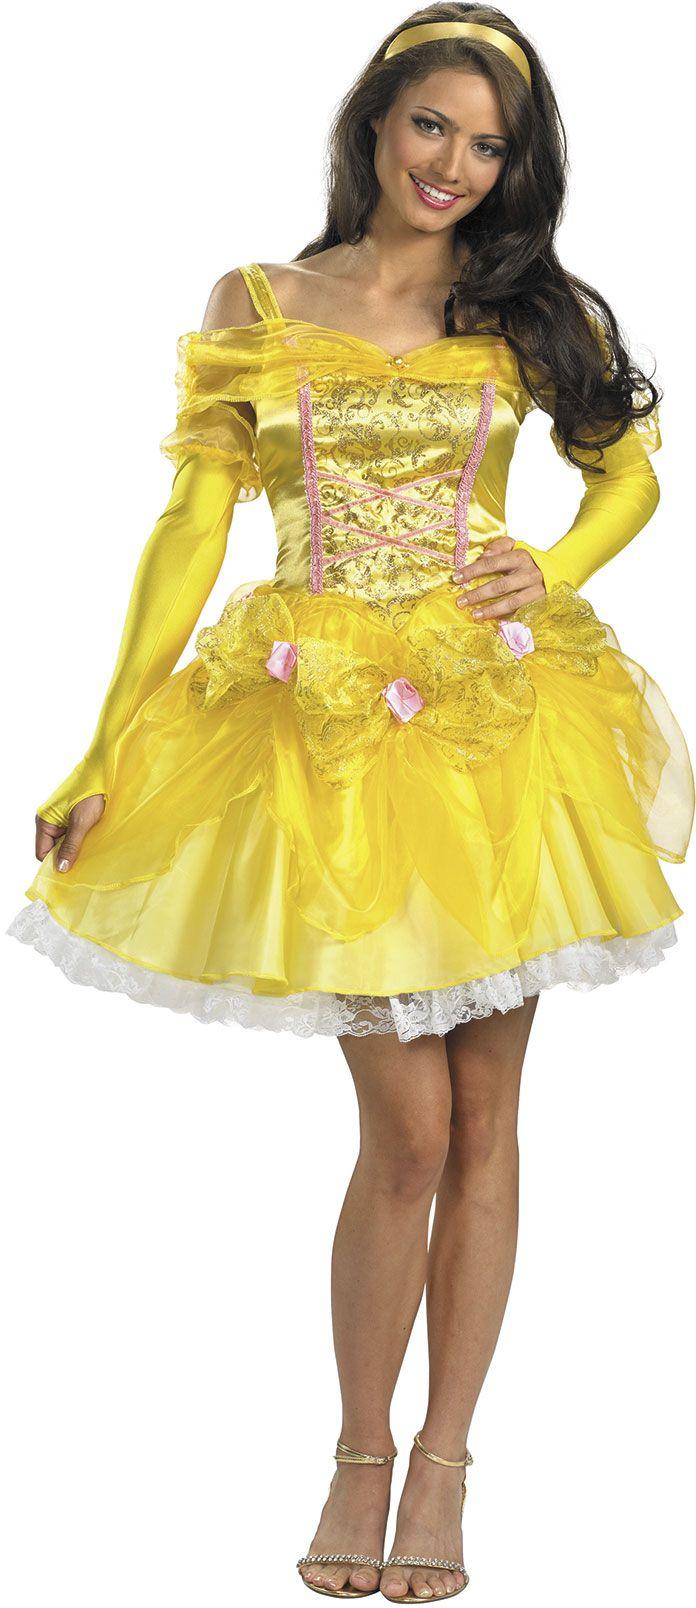 Belle Sassy Costume Beauty U0026 The Beast   Fairy Tale Costumes At Escapade™ UK    Escapade Fancy Dress On Twitter: @Escapade_UK